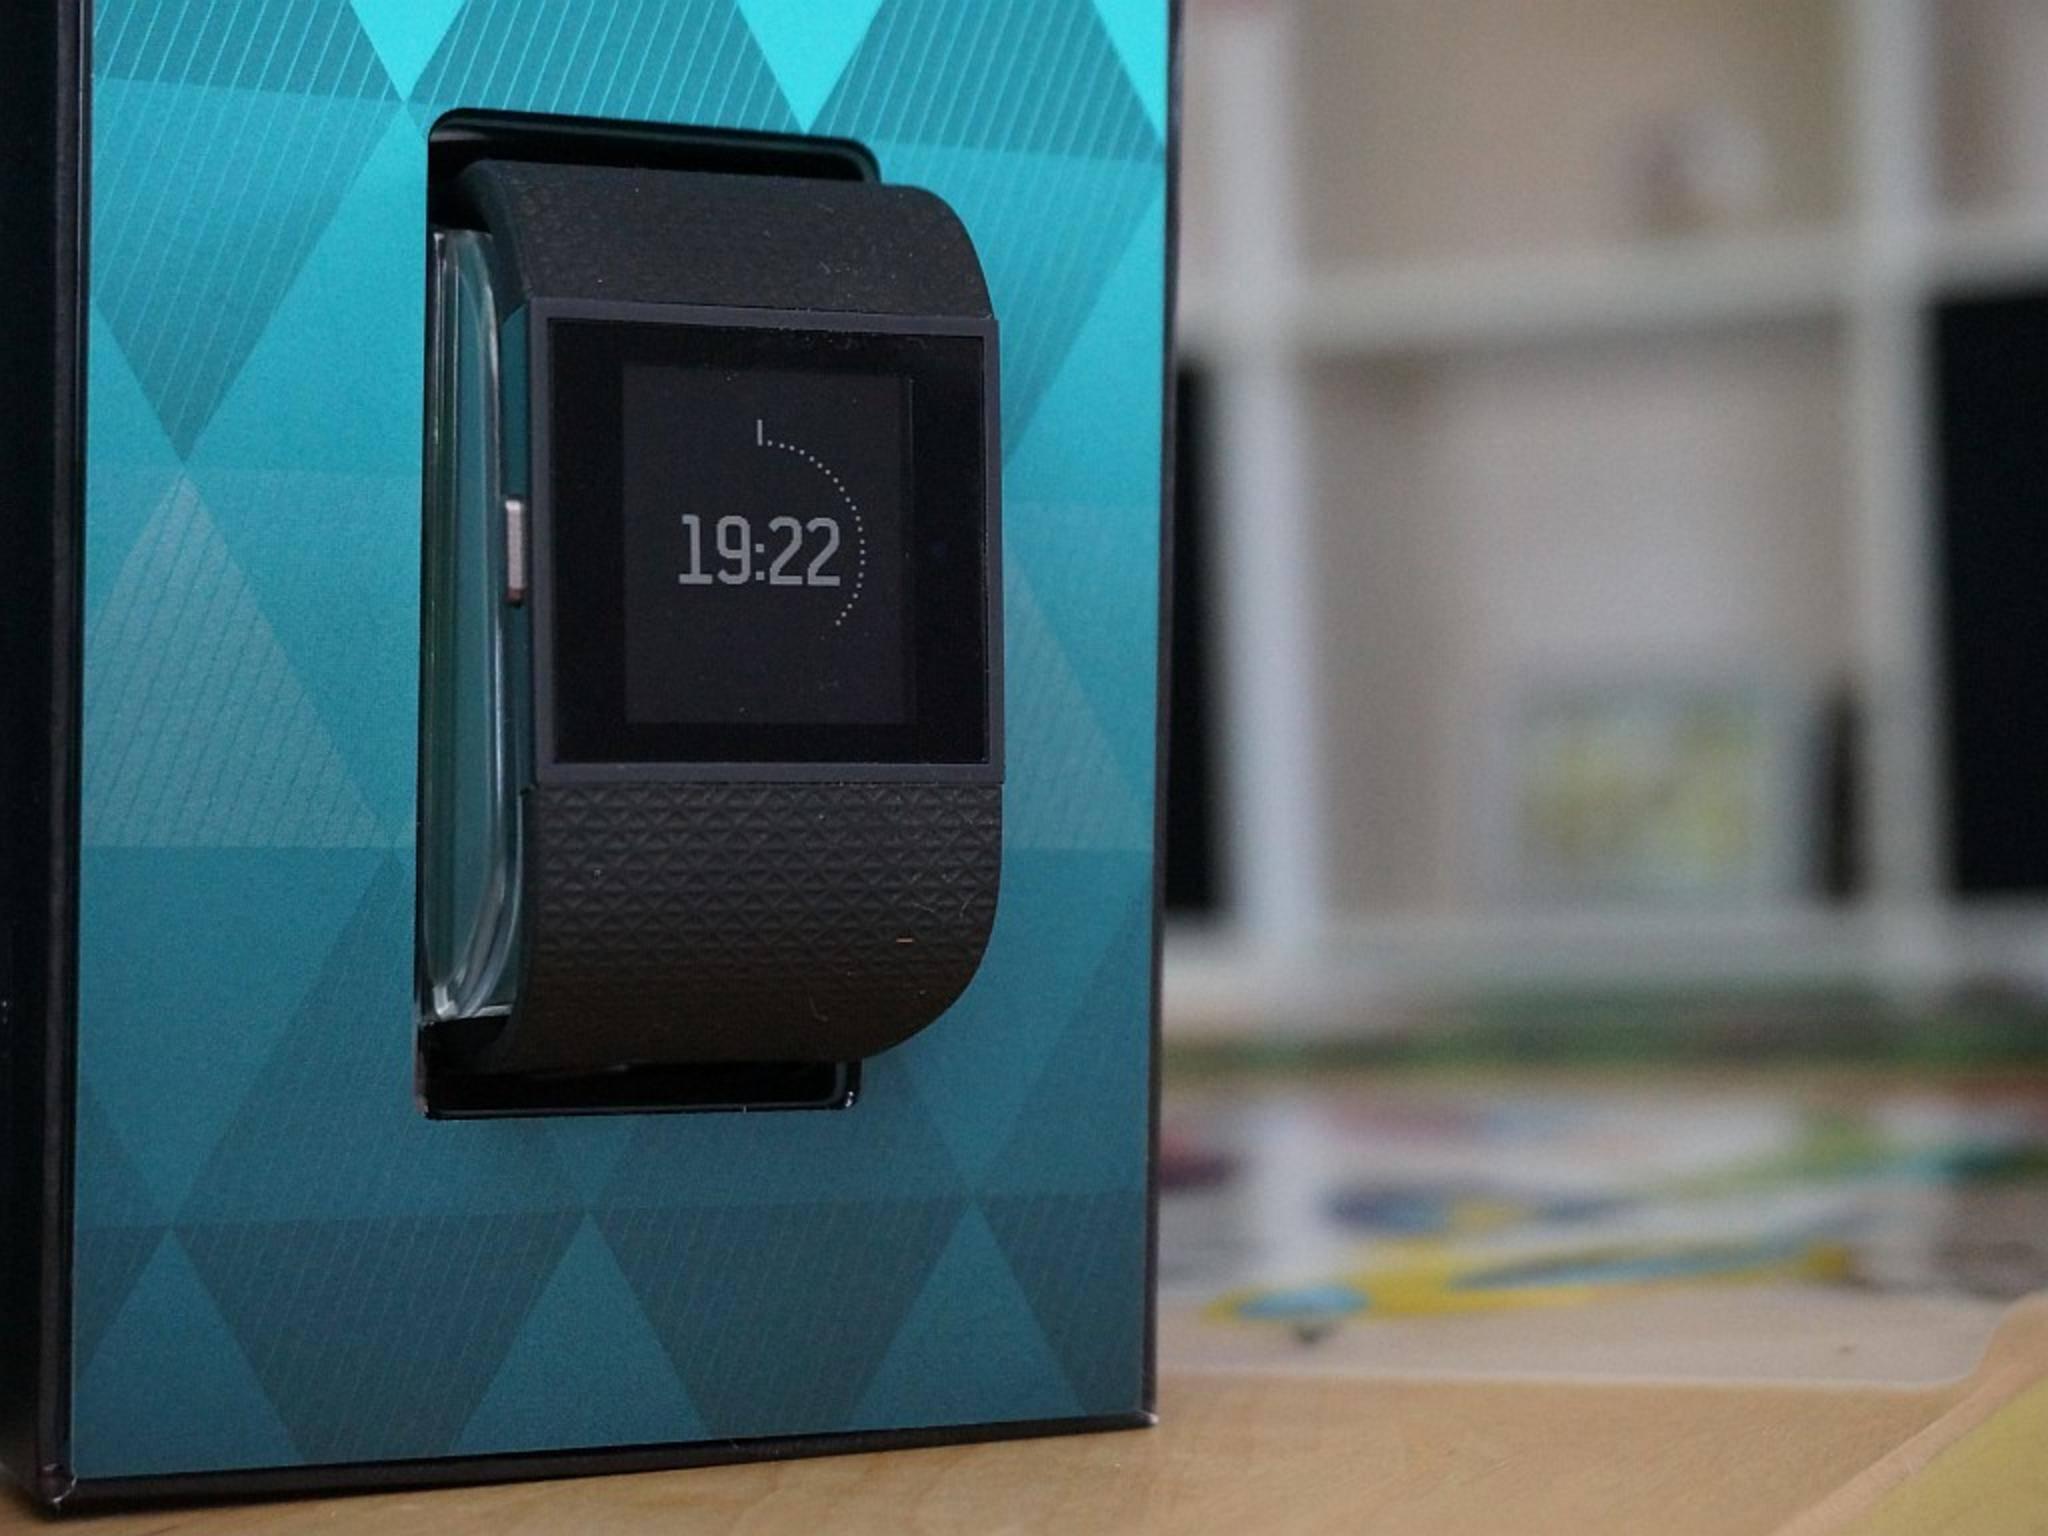 Fitbit Surge 3